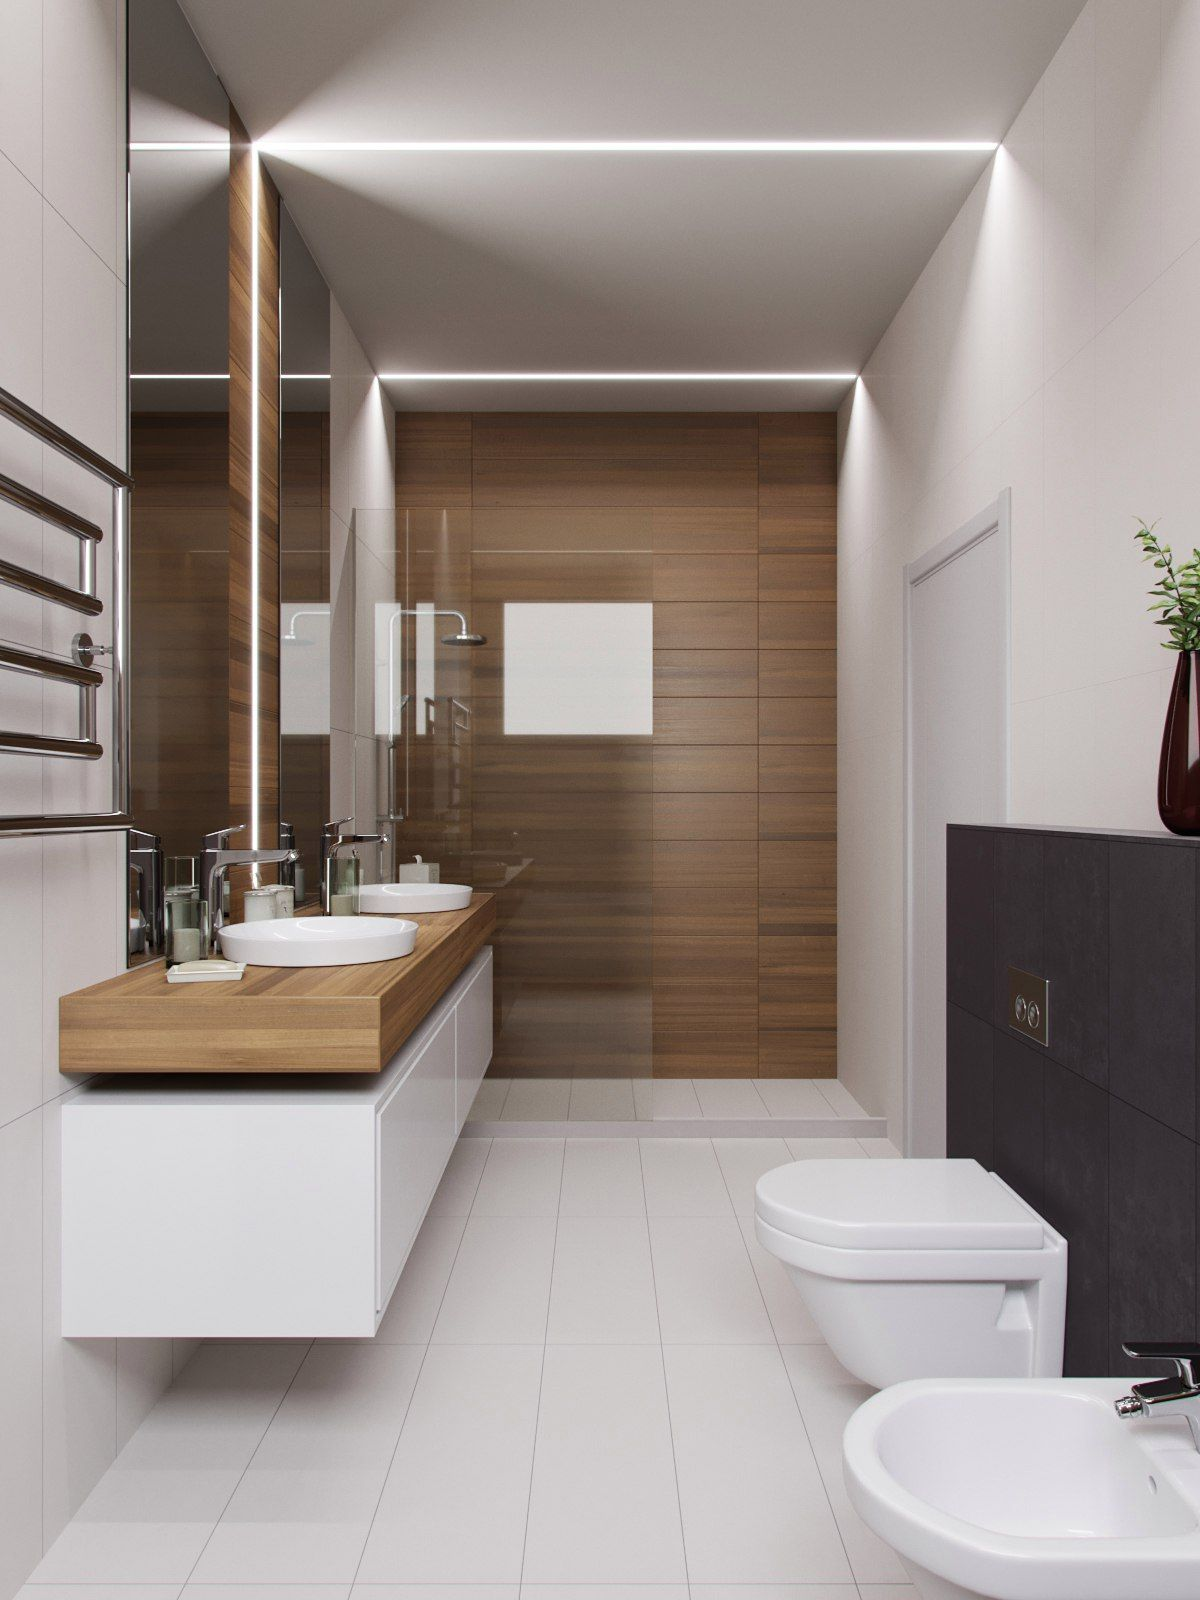 Sanuzel Bathroom Design Inspiration Bathroom Design Luxury Modern Bathroom Design